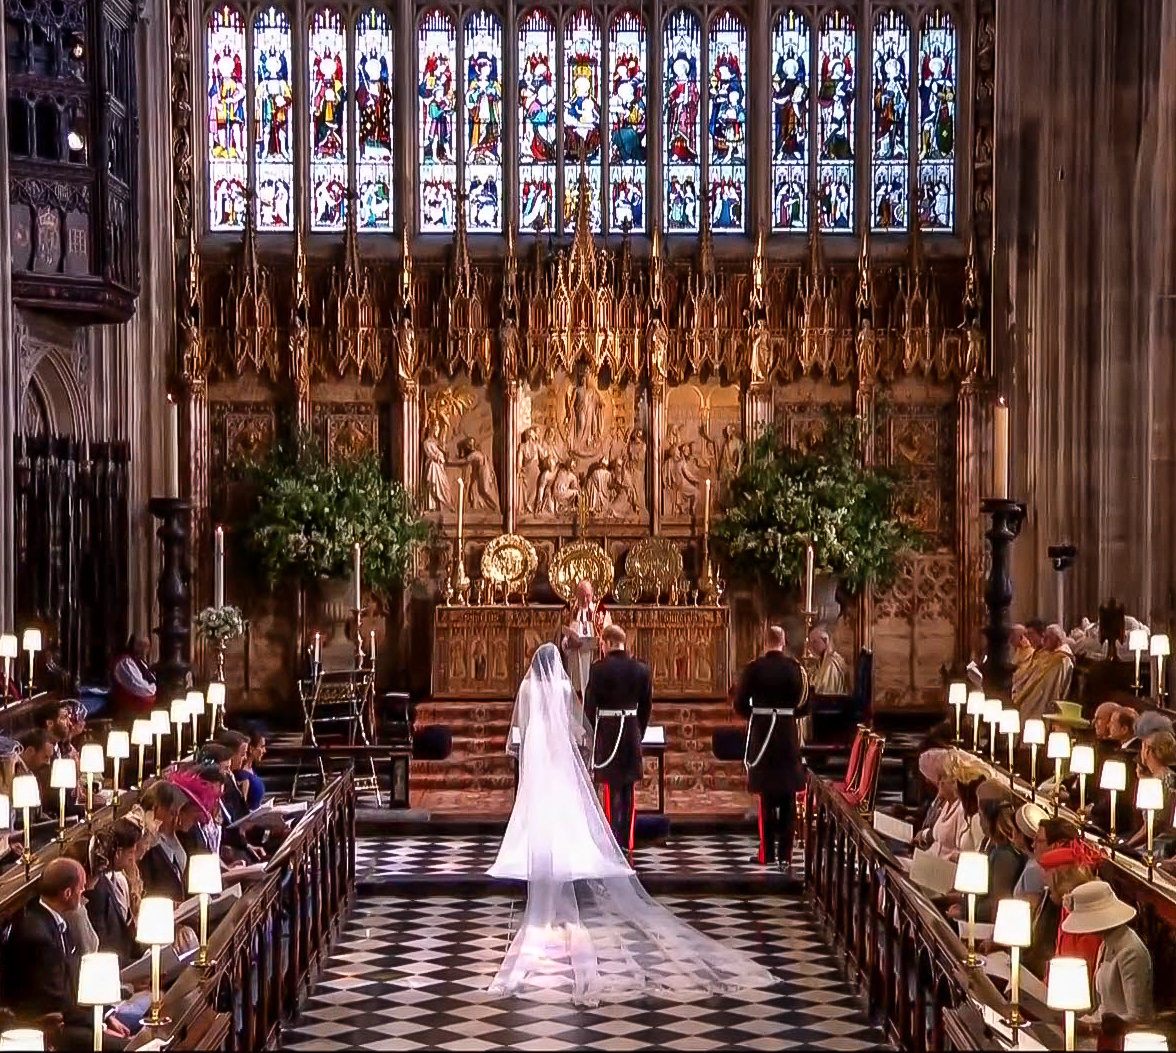 The 2018 Royal Wedding Of Meghan Markle And Prince Harry